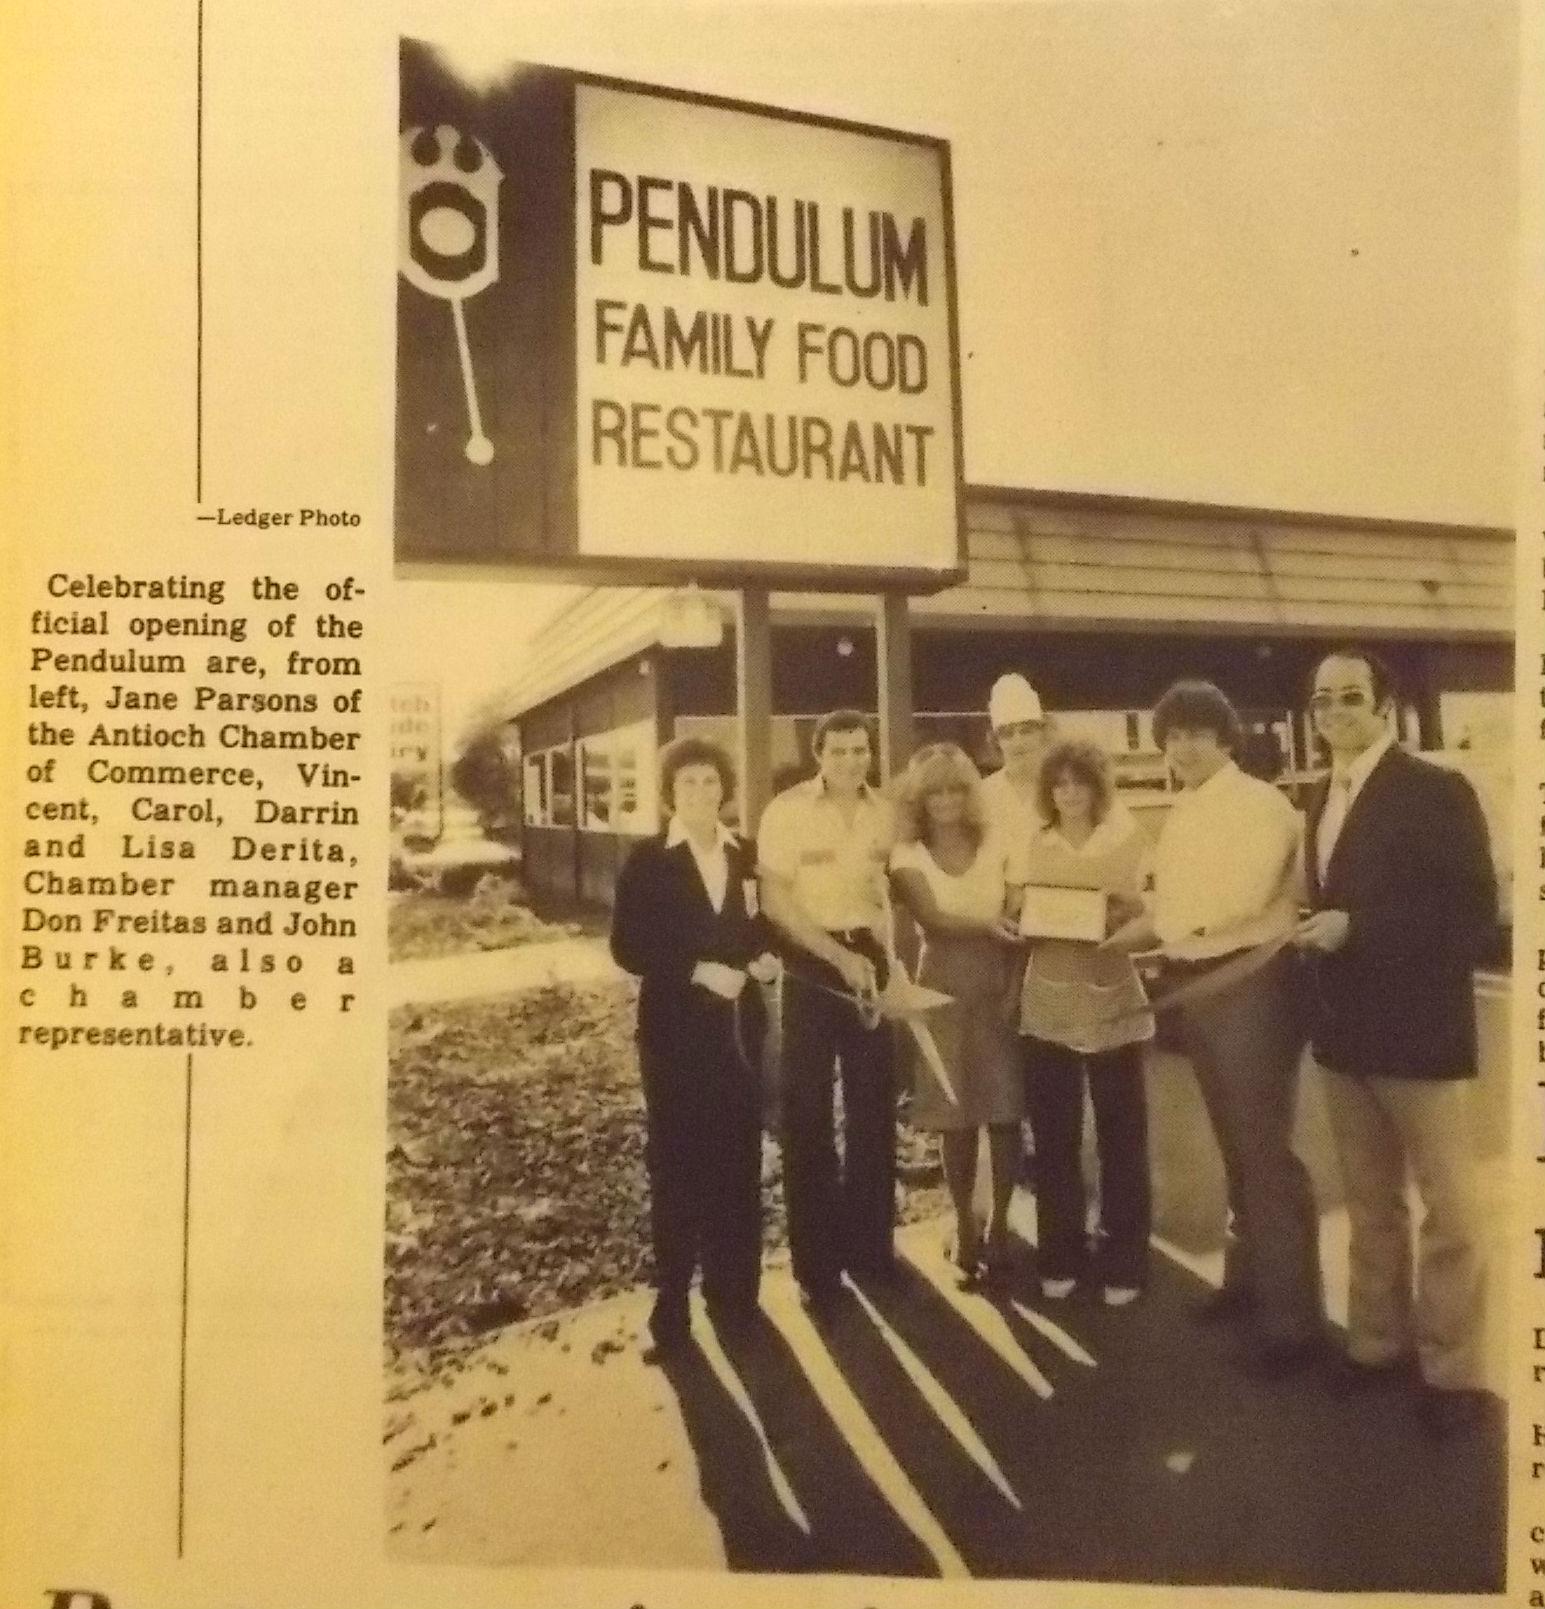 Pendulum Restaurant Fall 1979